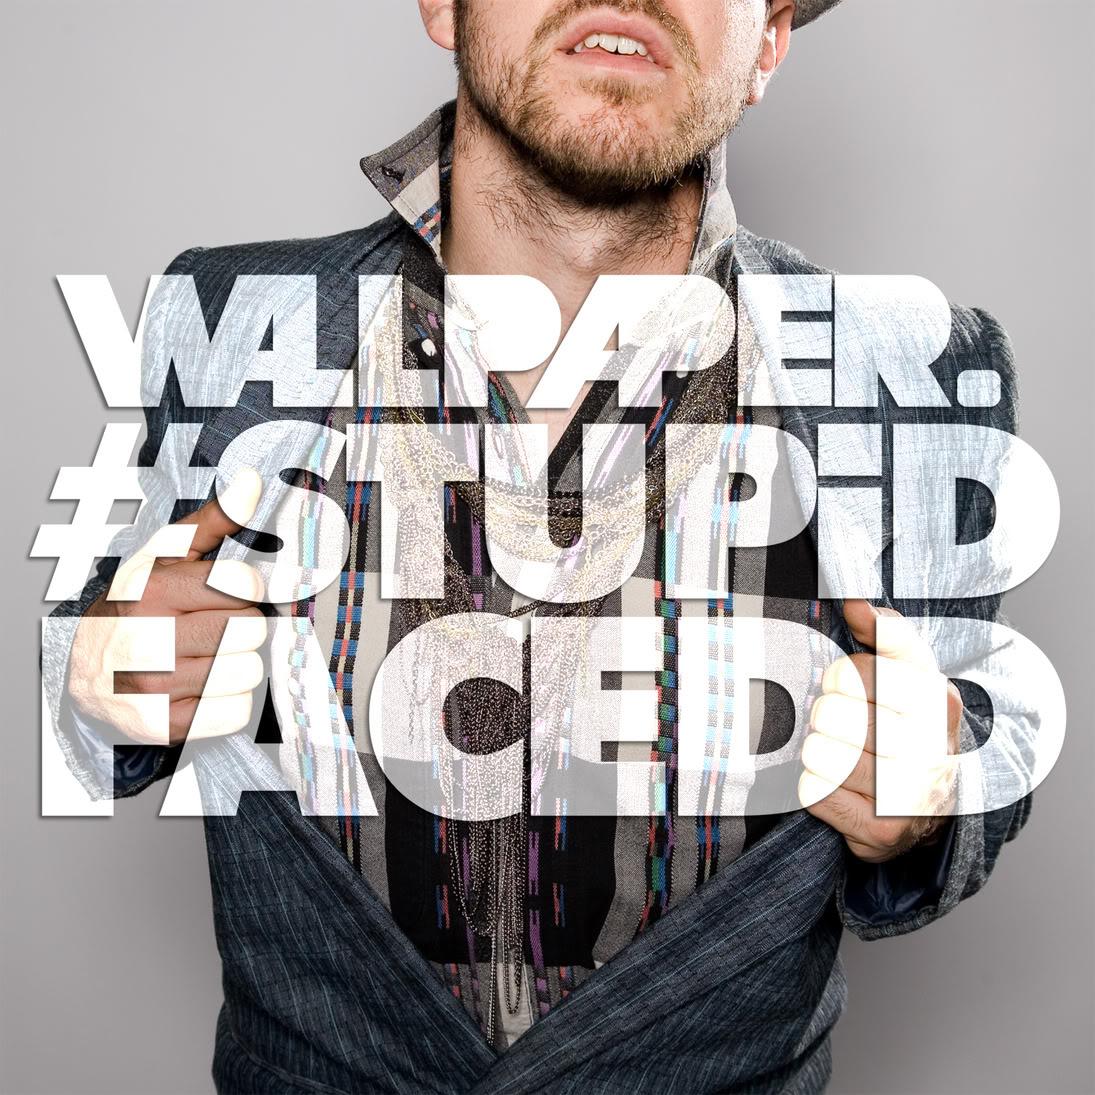 http://2.bp.blogspot.com/-SsY-tWV0gJg/Tj8v0o11XiI/AAAAAAAAAHA/eOplQHs704g/s1600/wallpaper-stupidfacedd.jpg